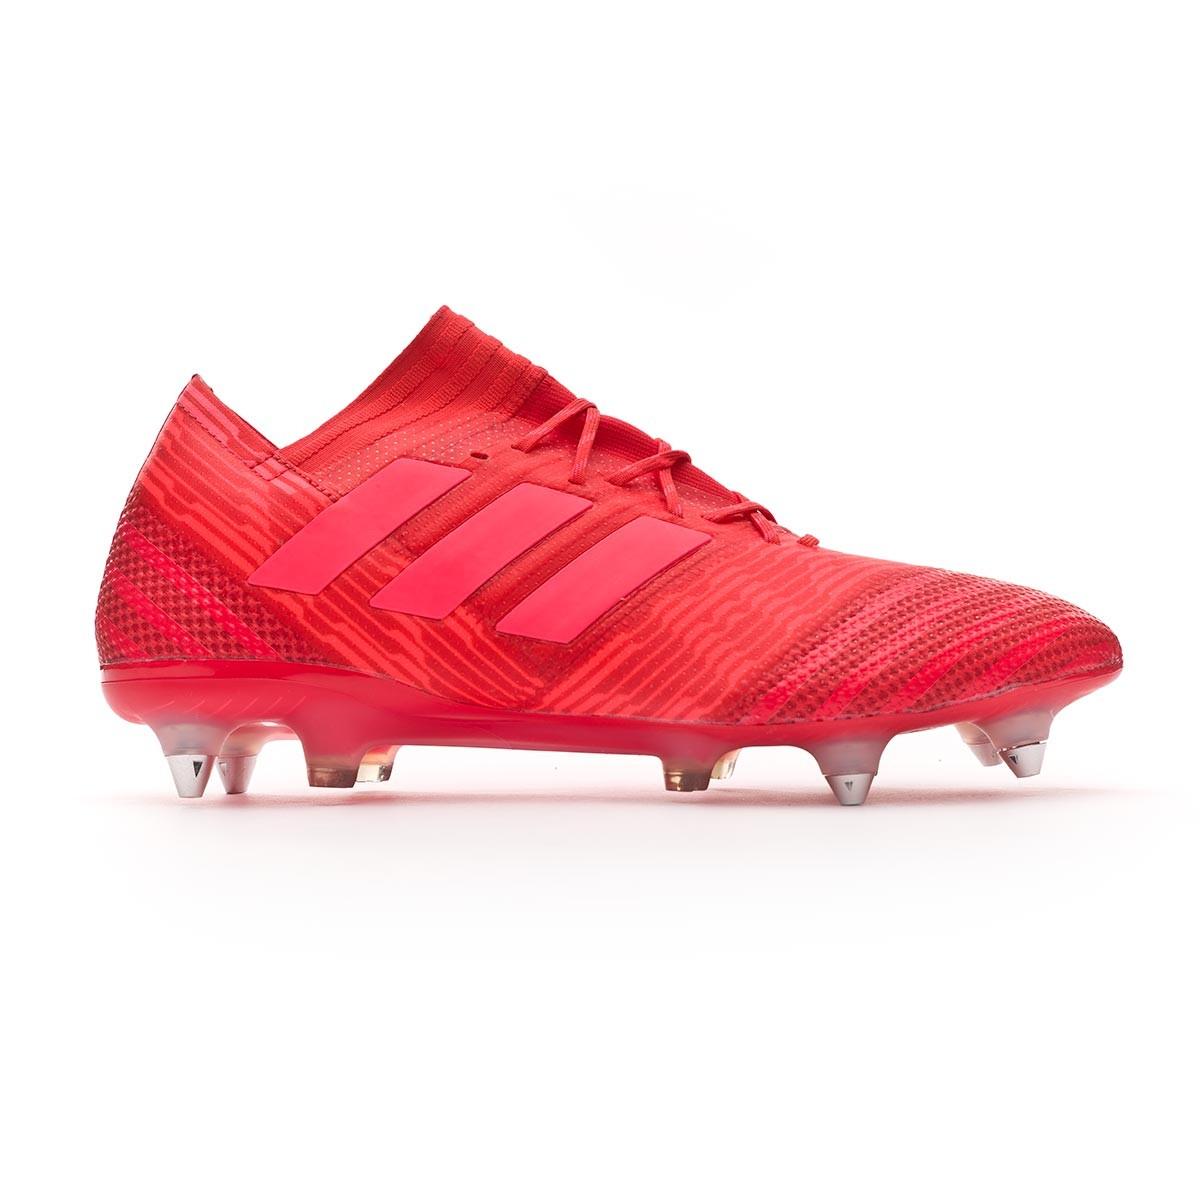 247ad7968 Football Boots adidas Nemeziz 17.1 SG Real coral-Red zest - Tienda de  fútbol Fútbol Emotion